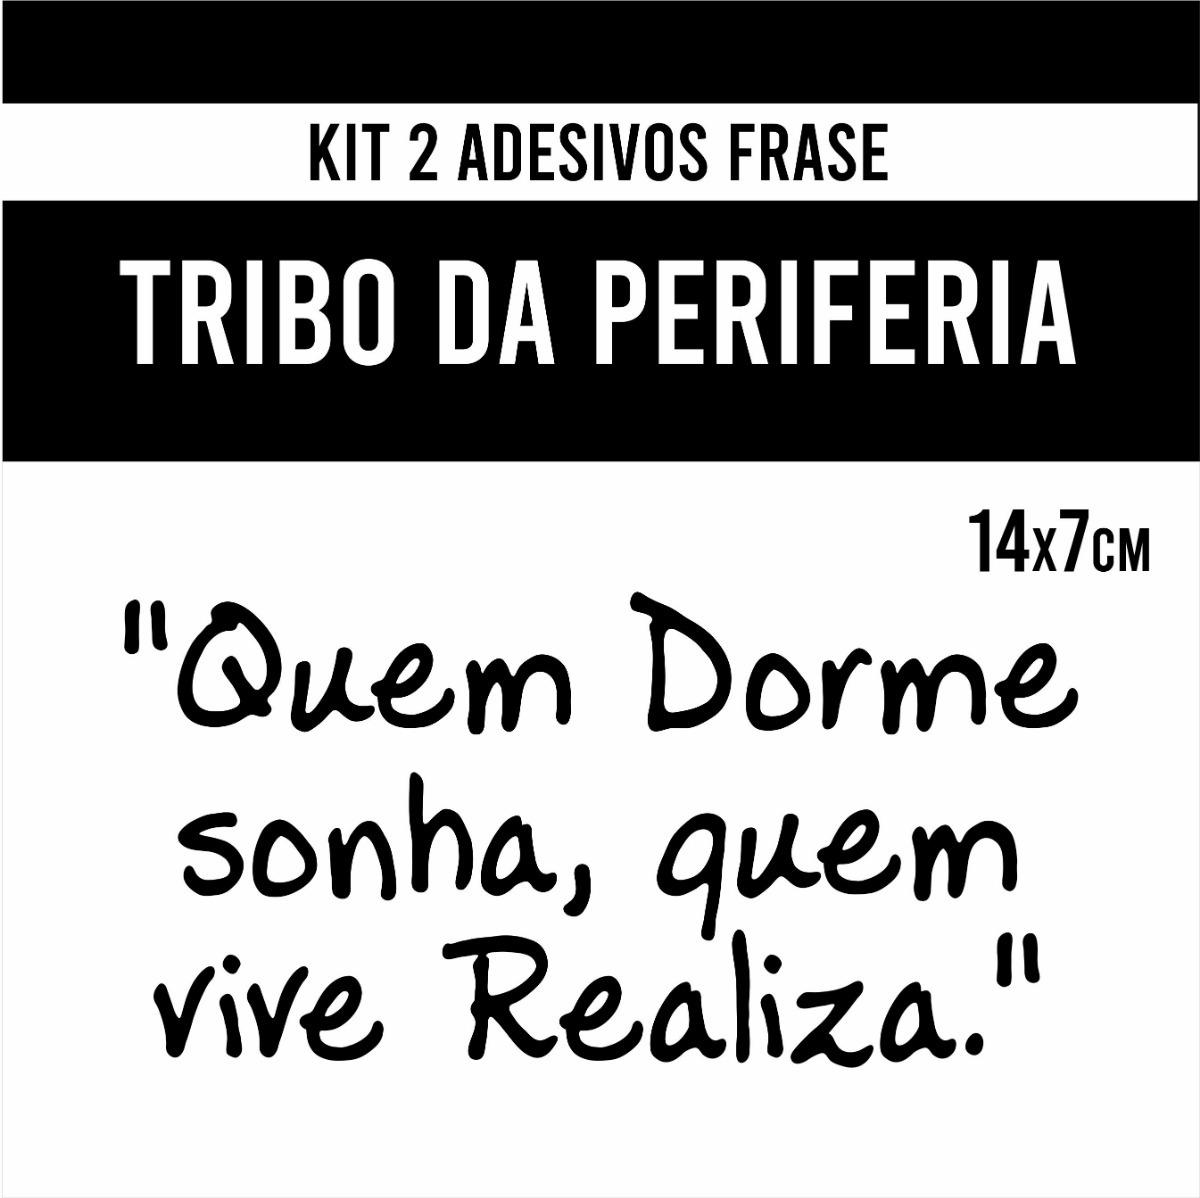 Kit 2 Adesivos Frase Tribo Da Periferia Quem Dorme Sonha